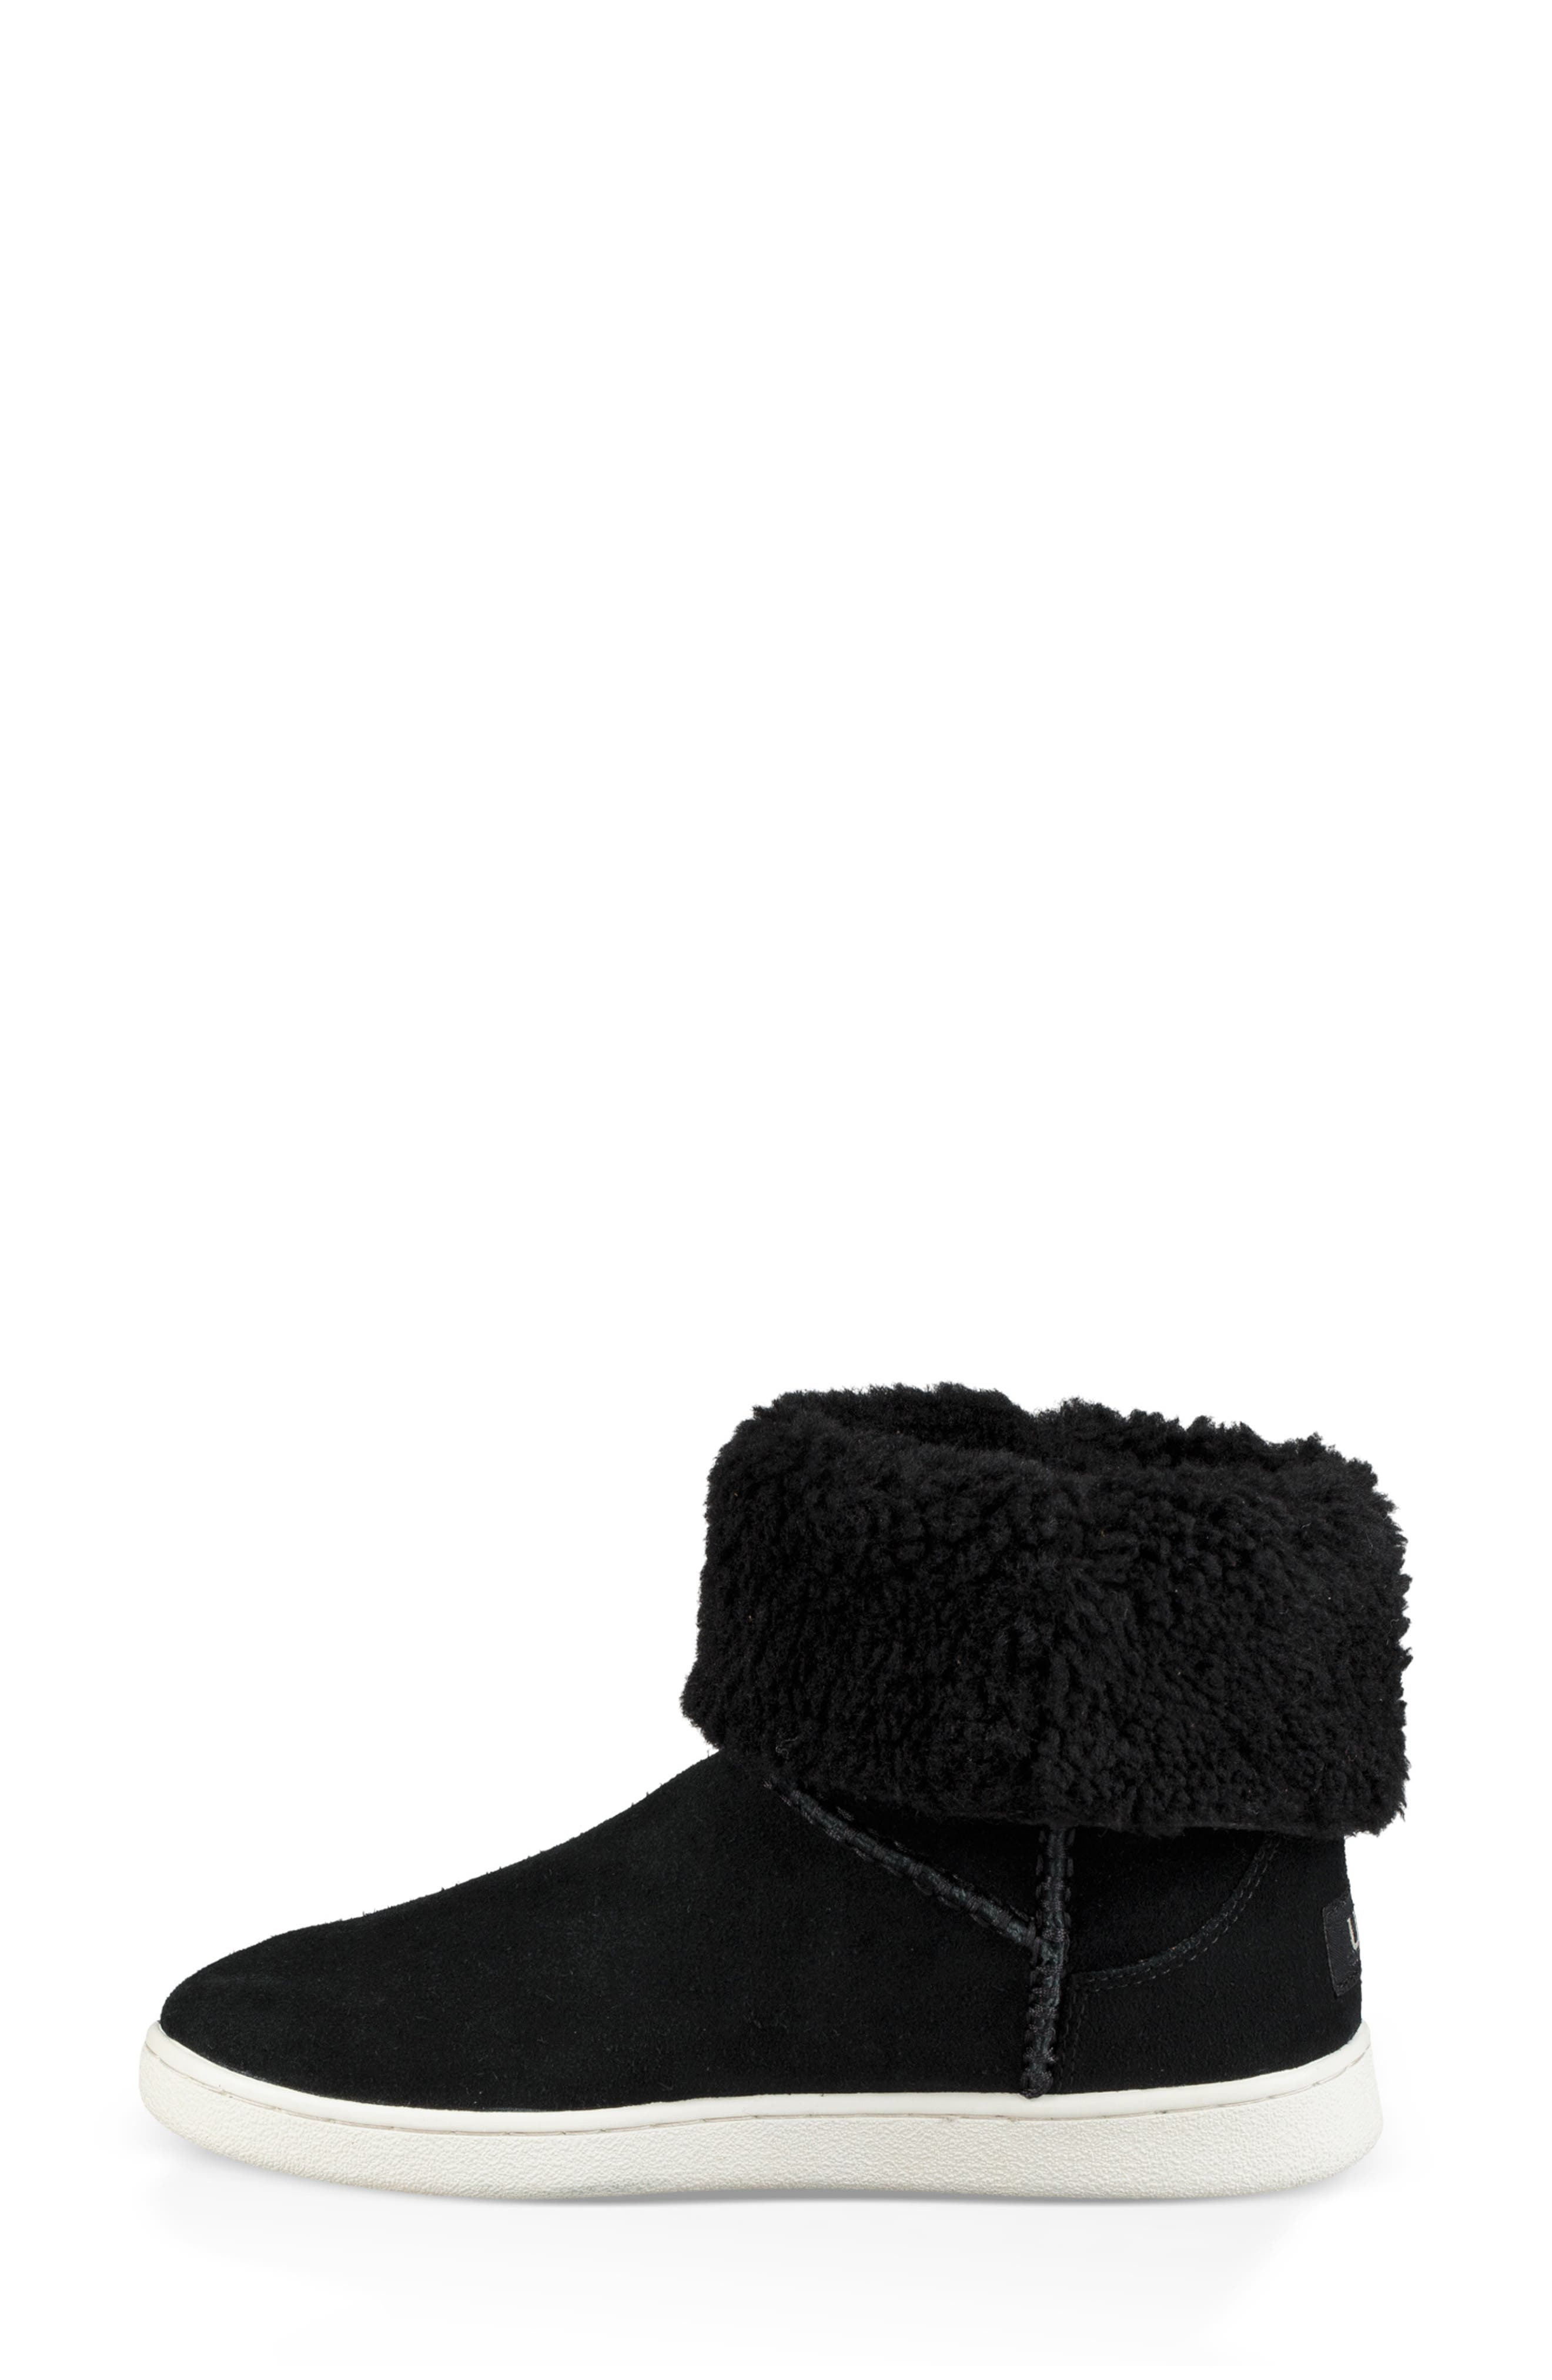 Mika Classic Genuine Shearling Sneaker,                             Alternate thumbnail 8, color,                             BLACK